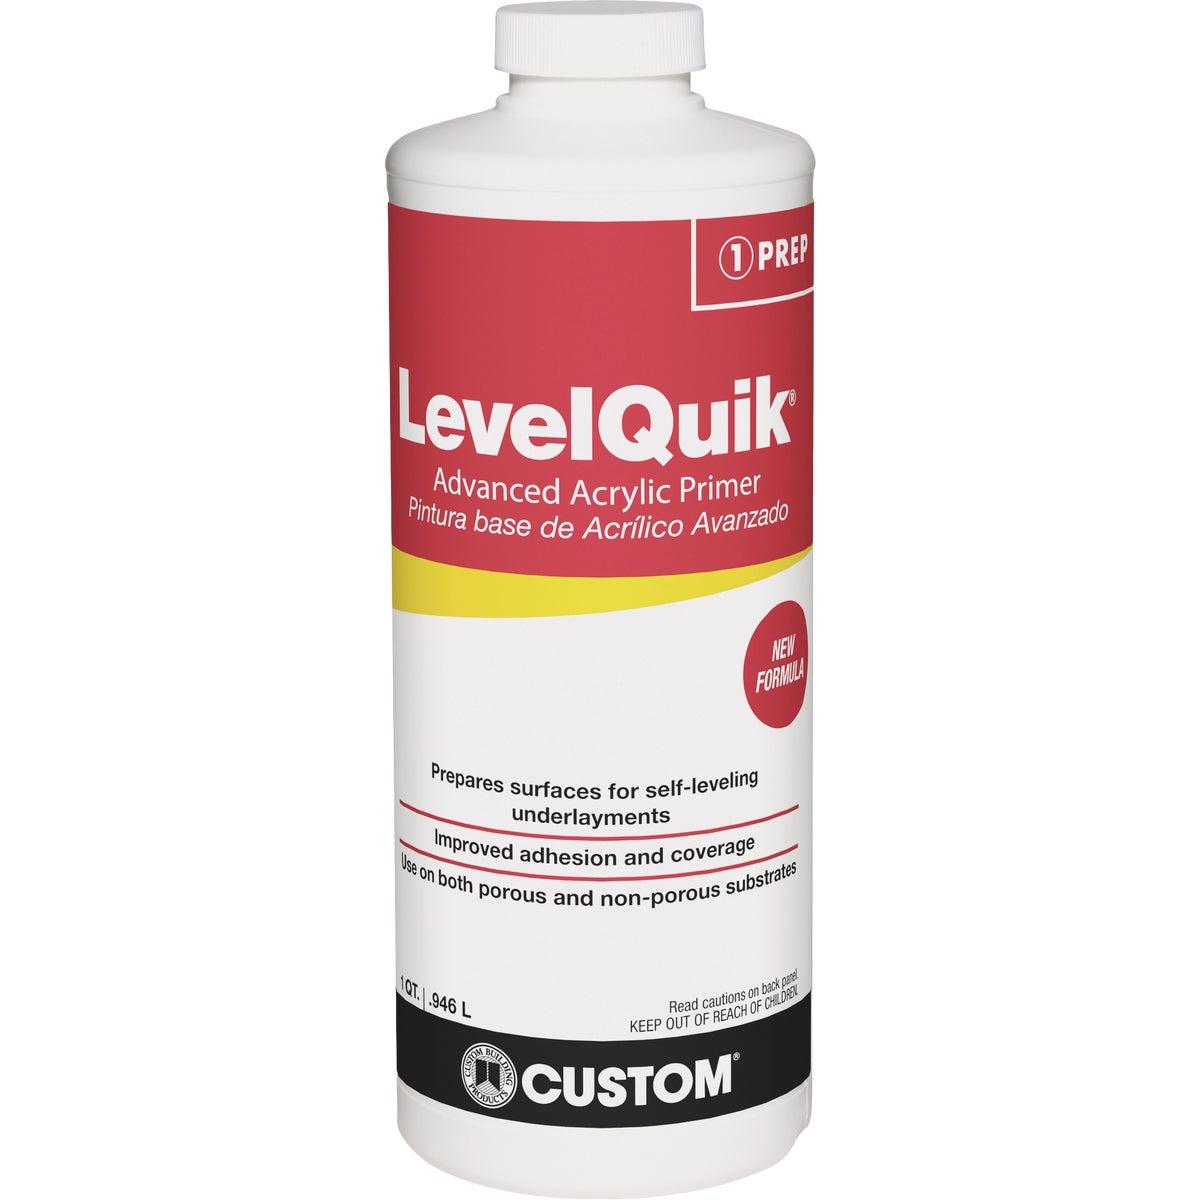 Qt Levlquik Latex Primer